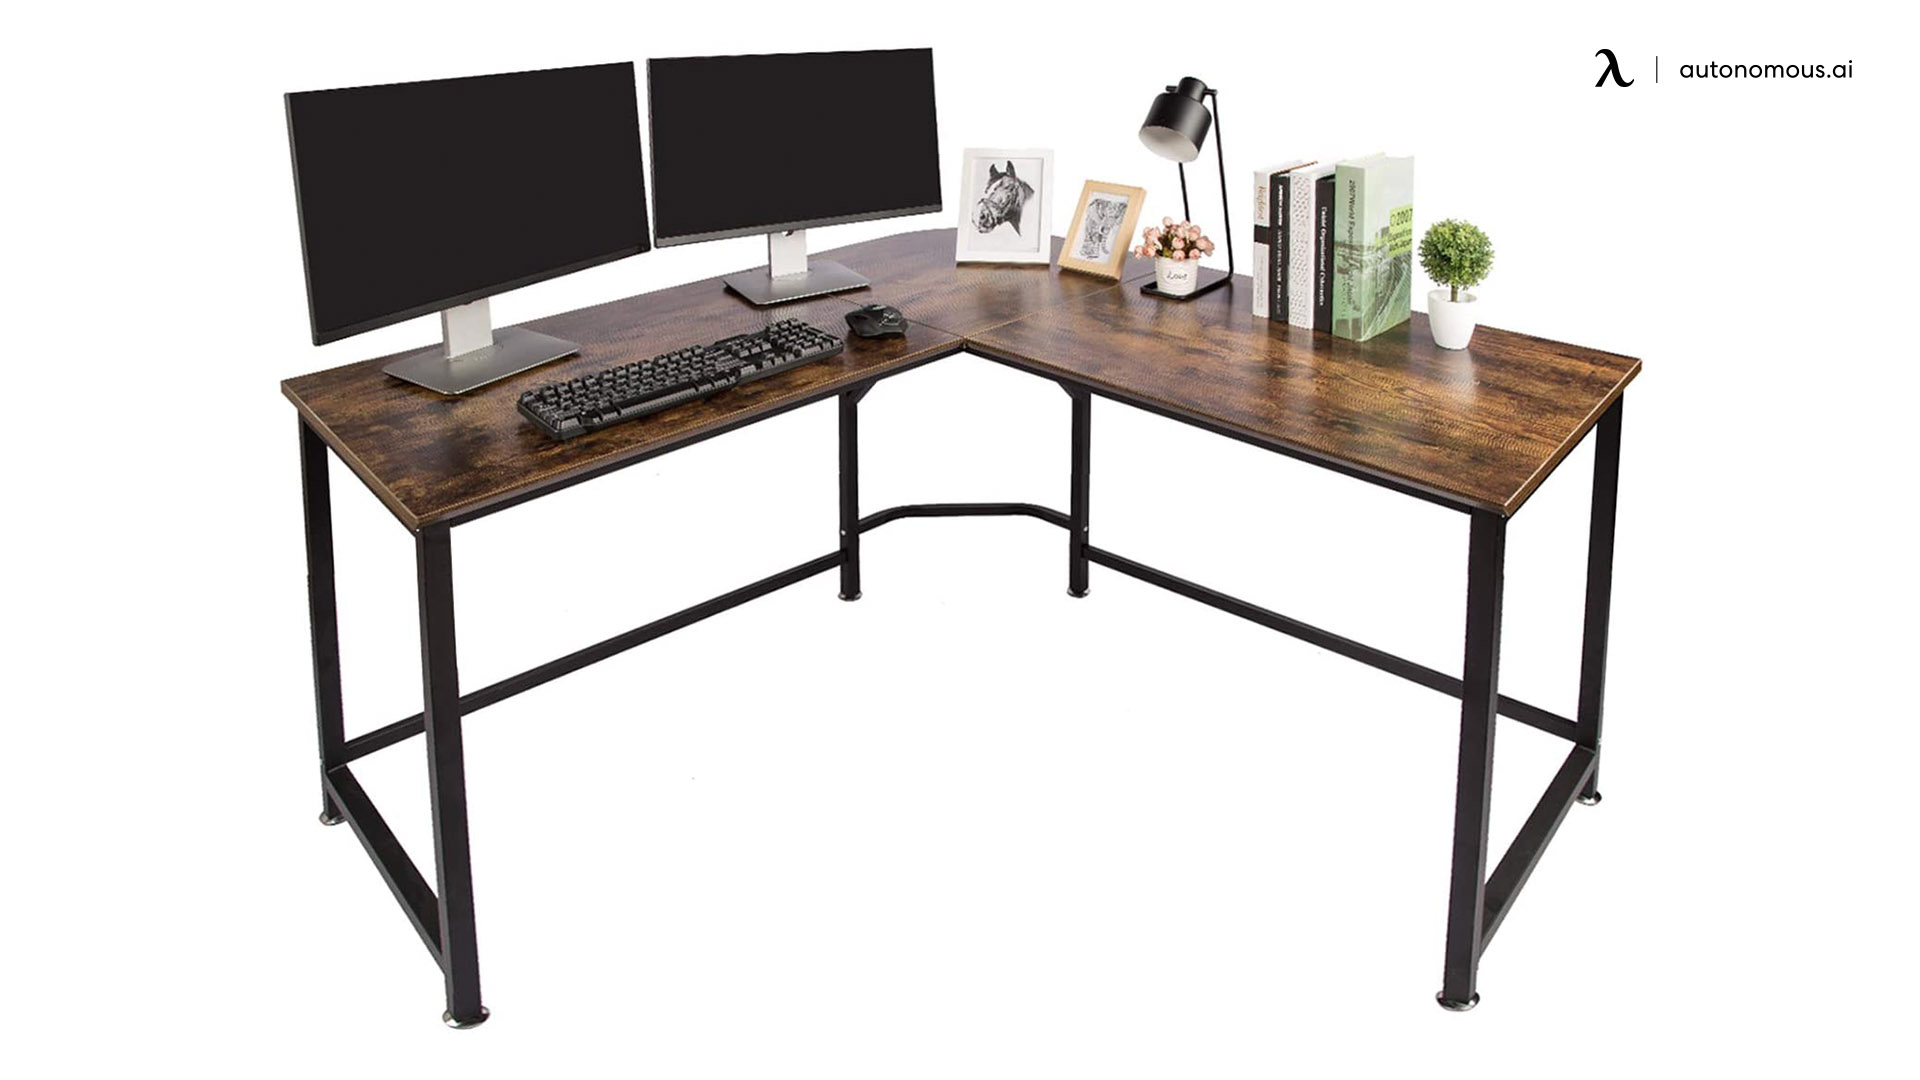 L-shaped corner workstation from Topsky